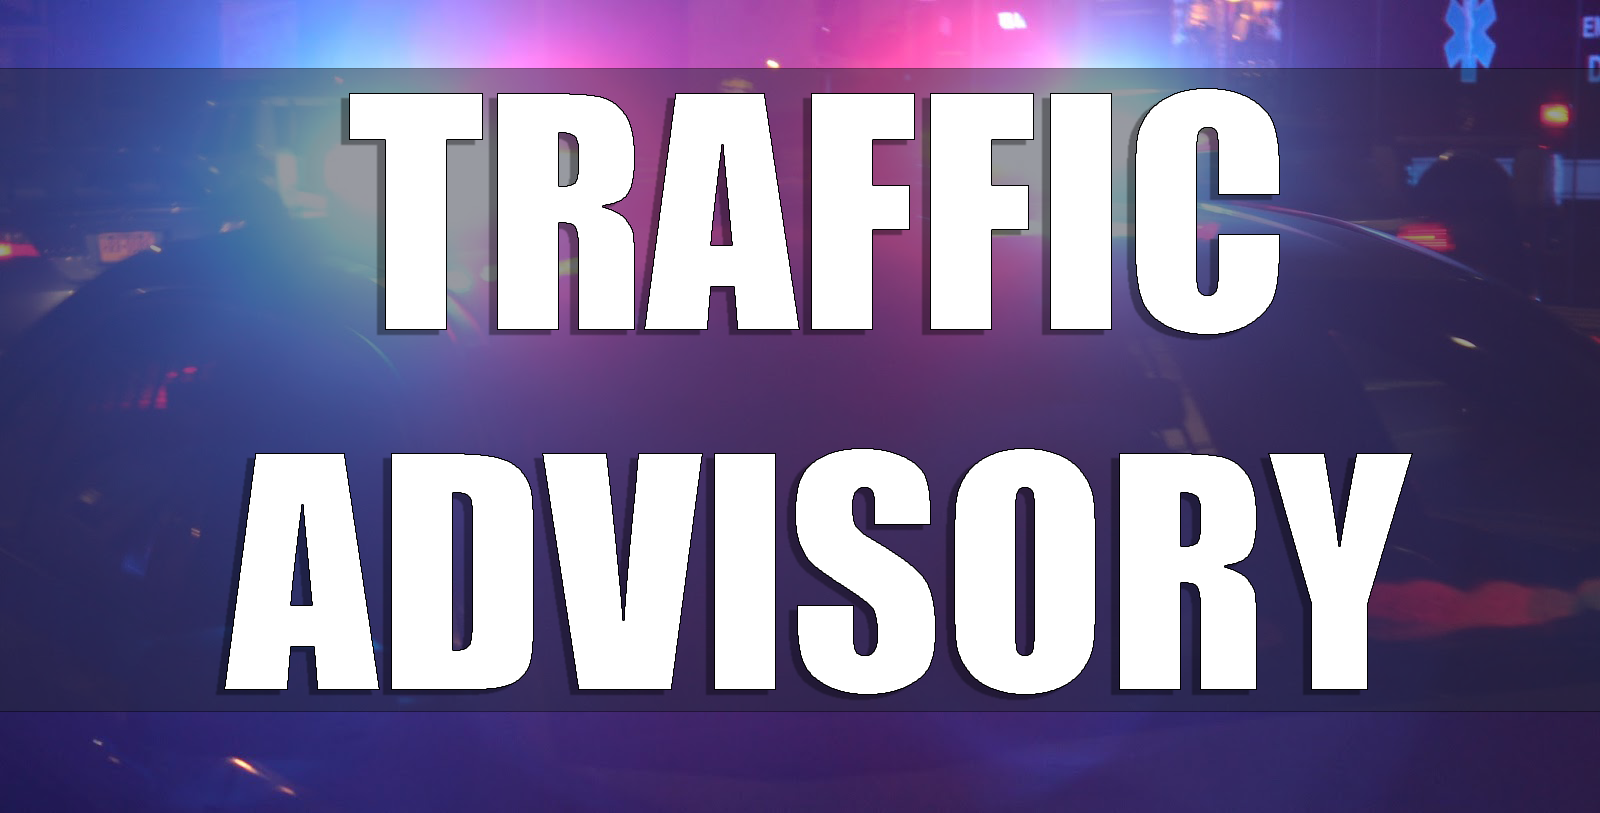 Traffic advisory issued